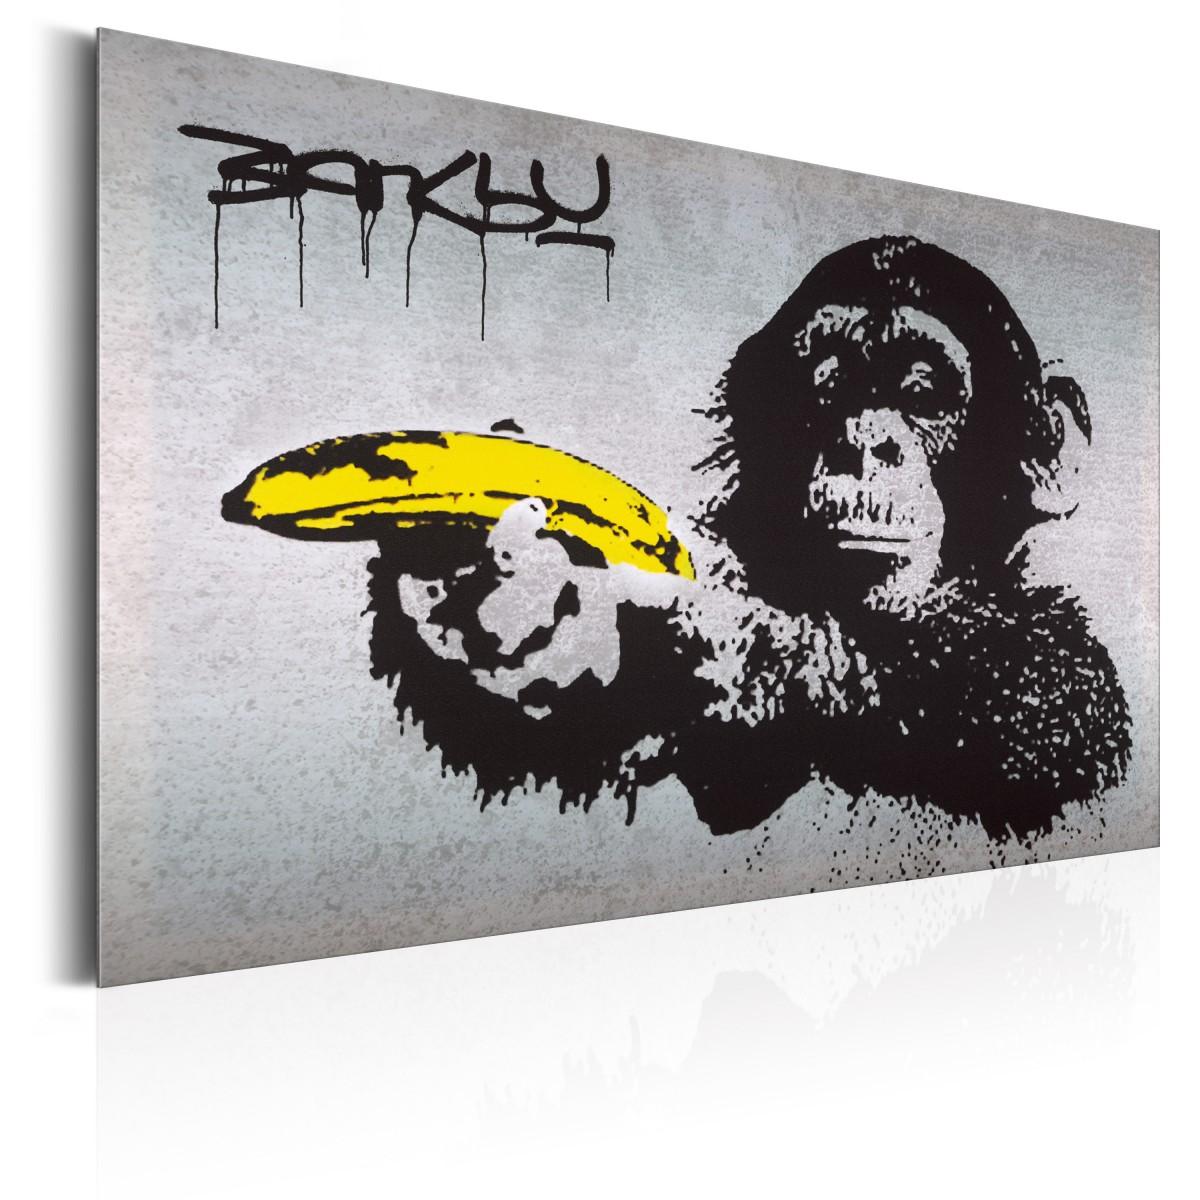 Plakat Metalowy Monkey With Banana Gun By Banksy